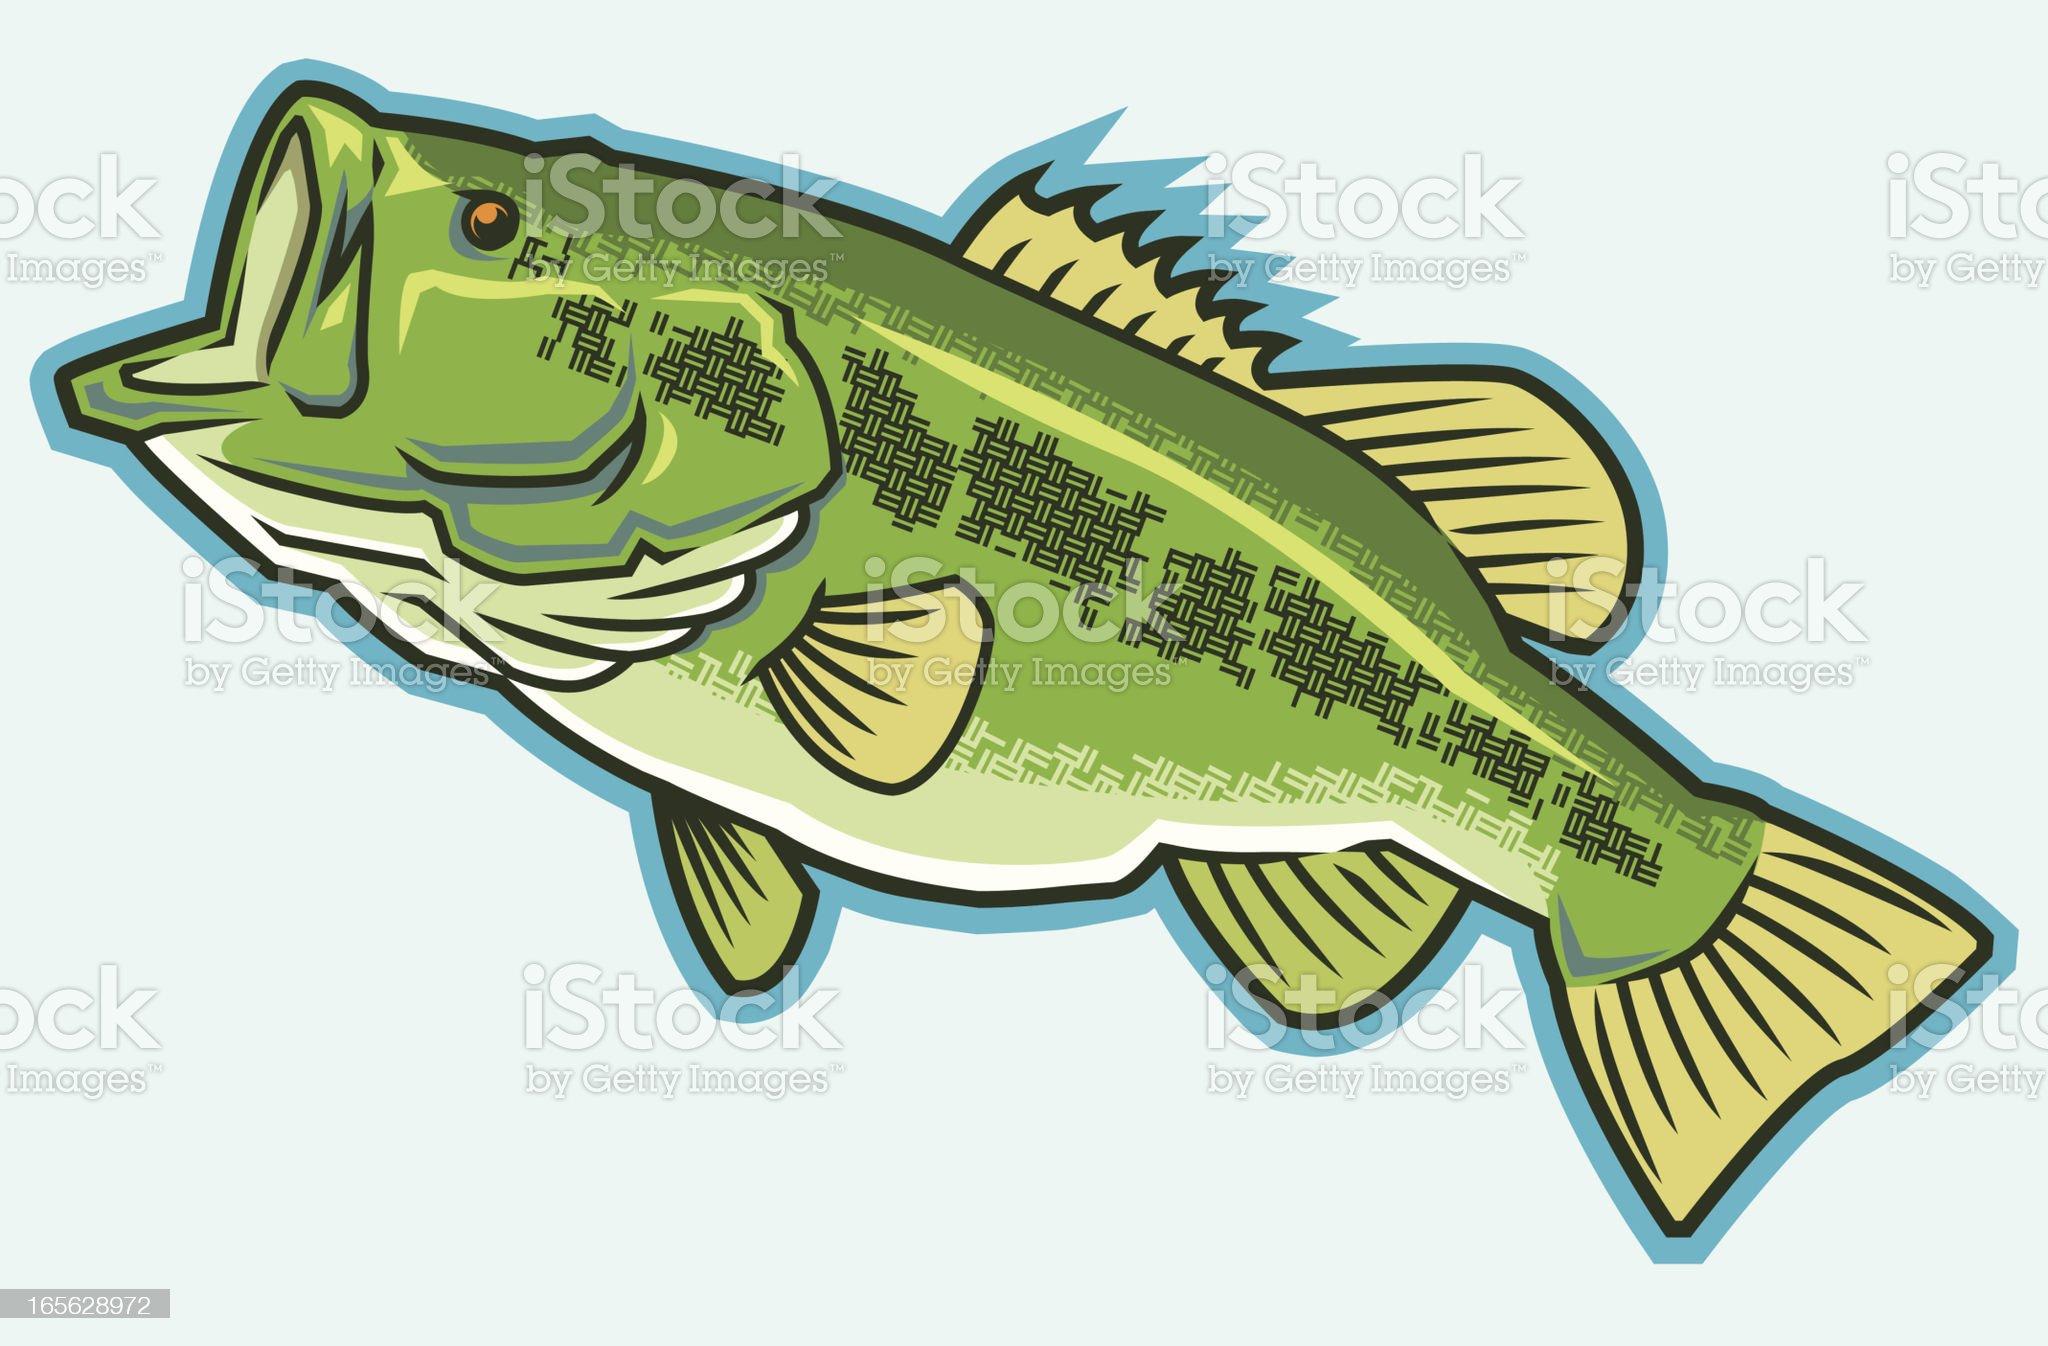 Big Ol' Bass royalty-free stock vector art